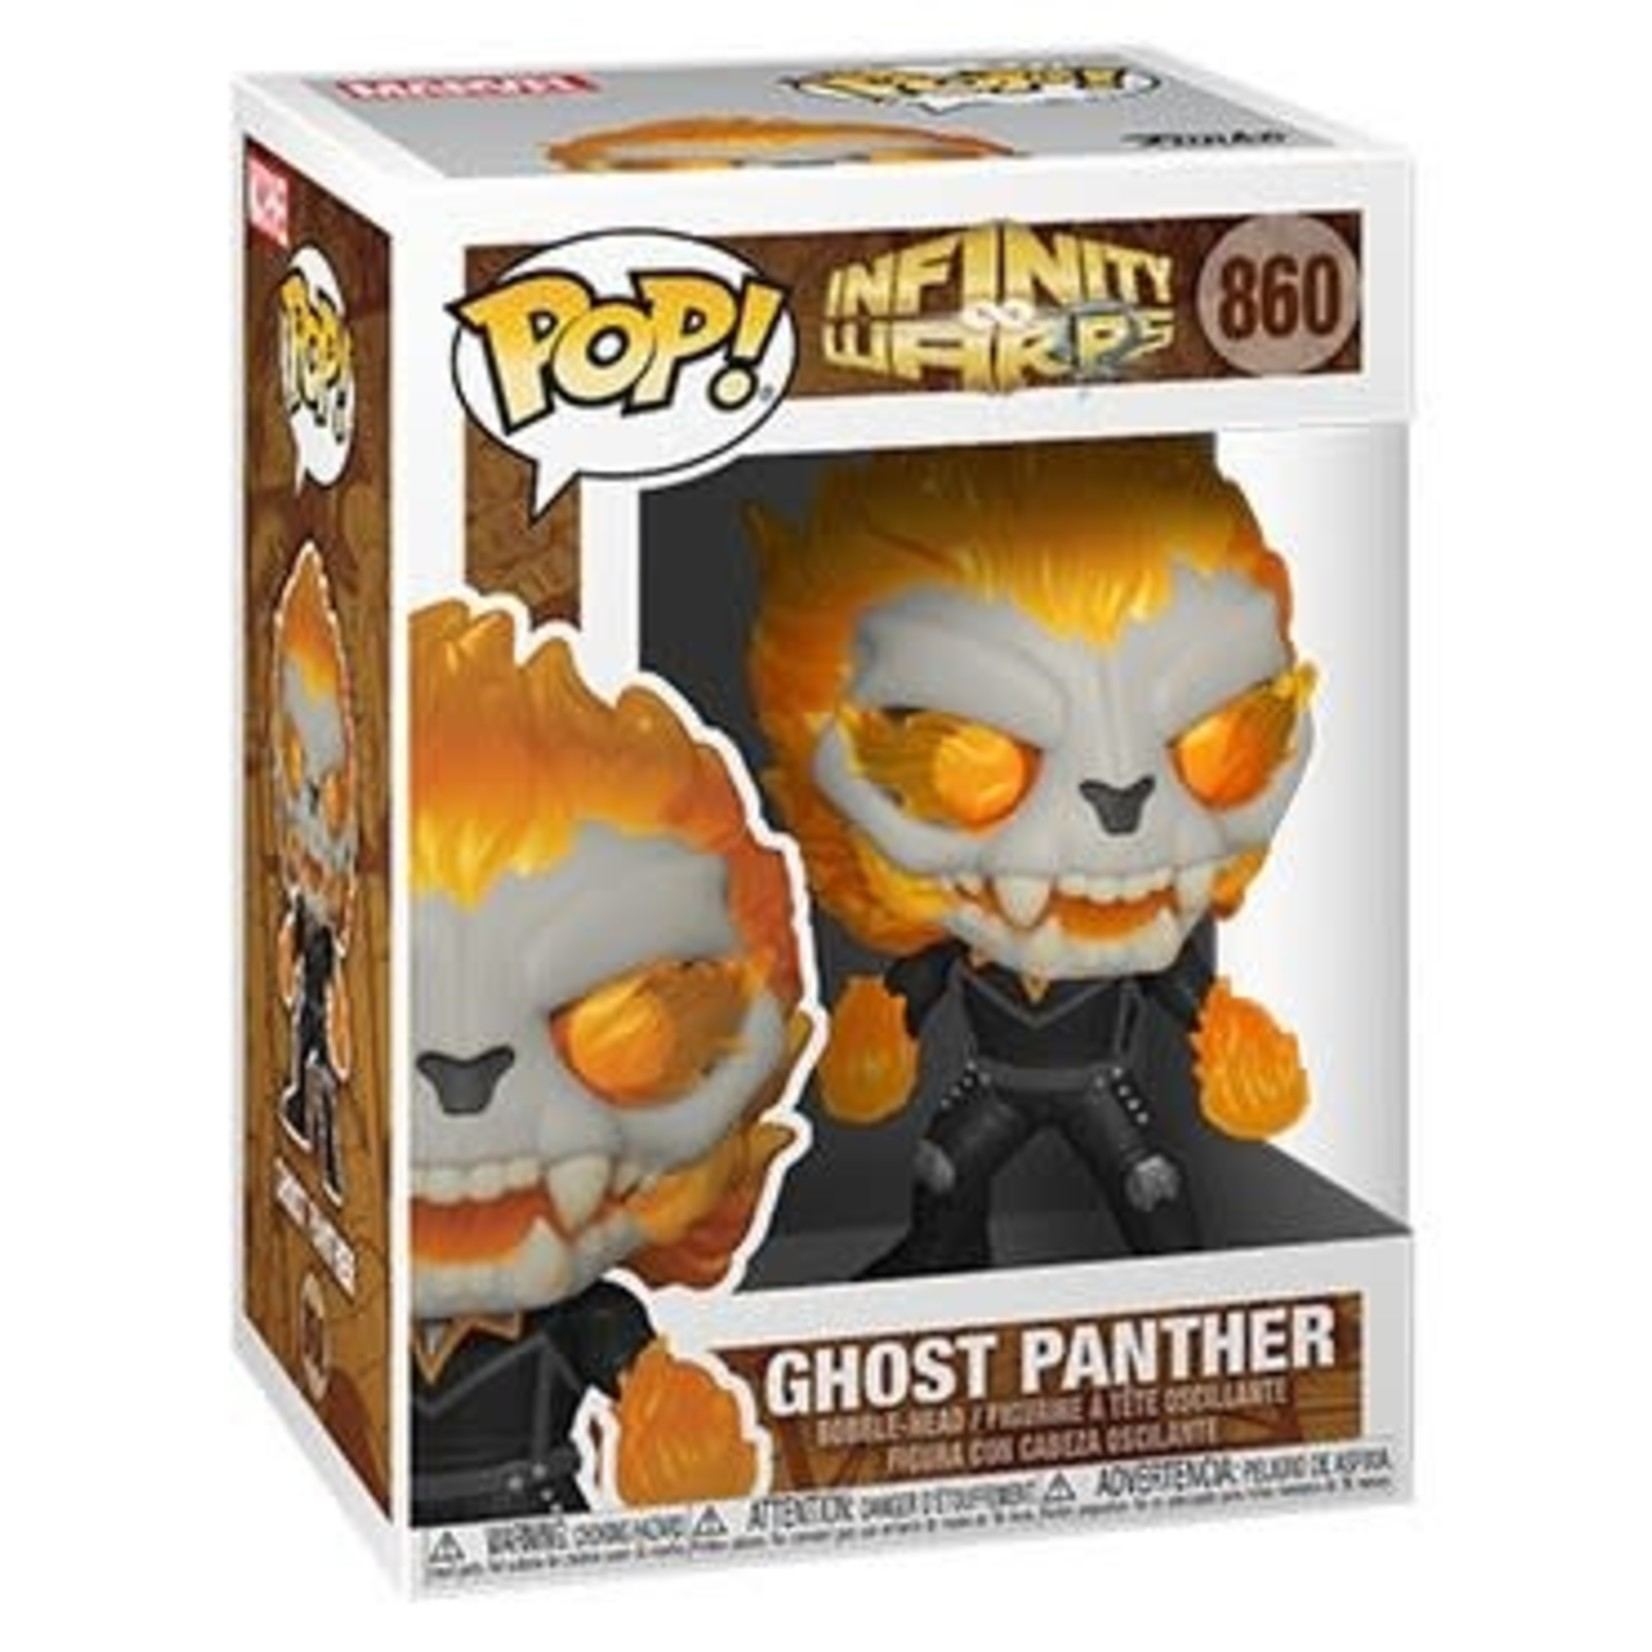 Funko Pop! POP! Marvel Infinity Warps - Ghost Panther